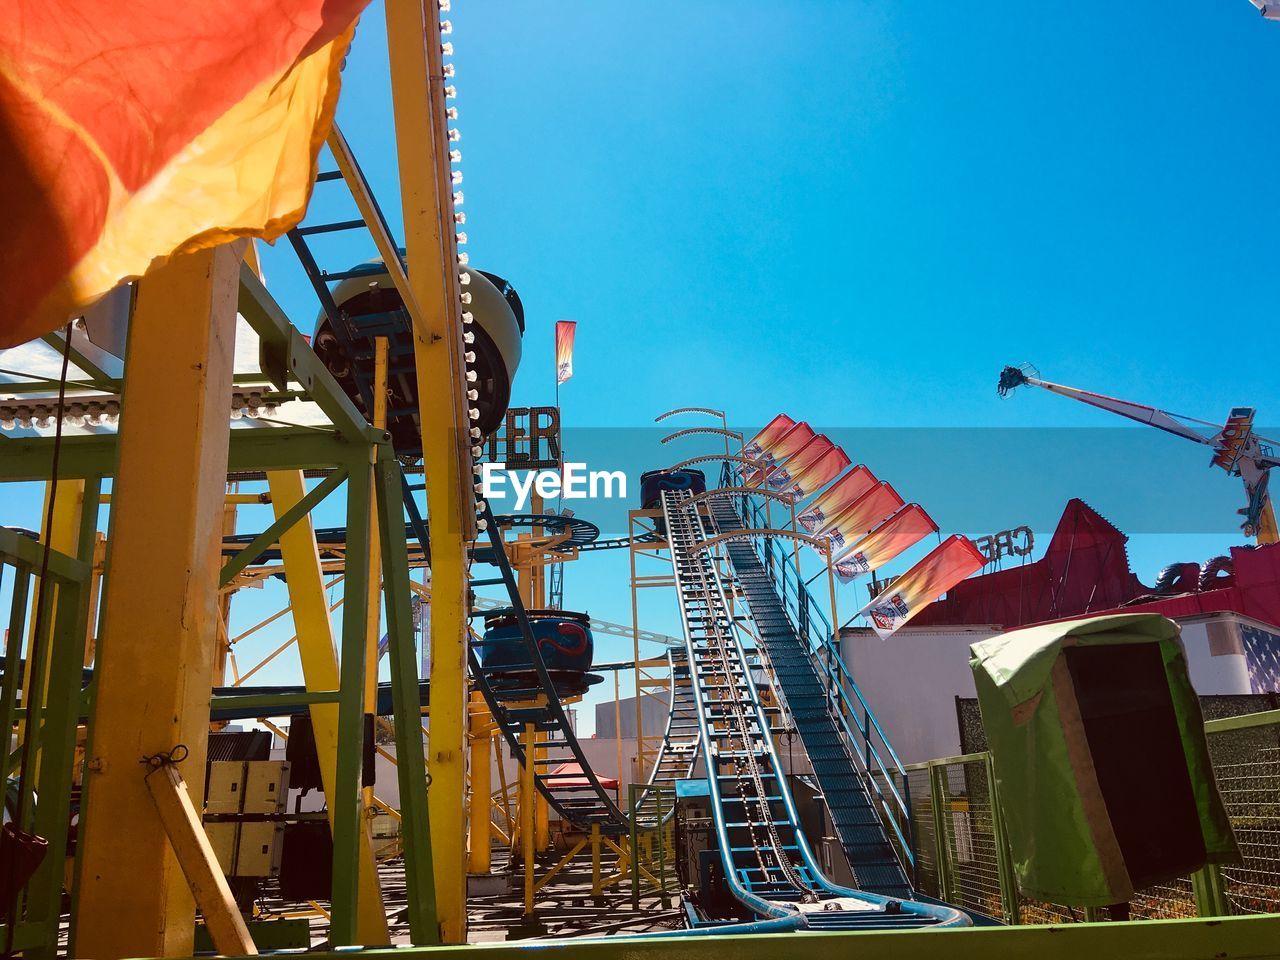 sky, amusement park, architecture, amusement park ride, low angle view, nature, day, clear sky, built structure, arts culture and entertainment, blue, outdoors, no people, rollercoaster, sunlight, metal, leisure activity, building exterior, machinery, enjoyment, excitement, fairground